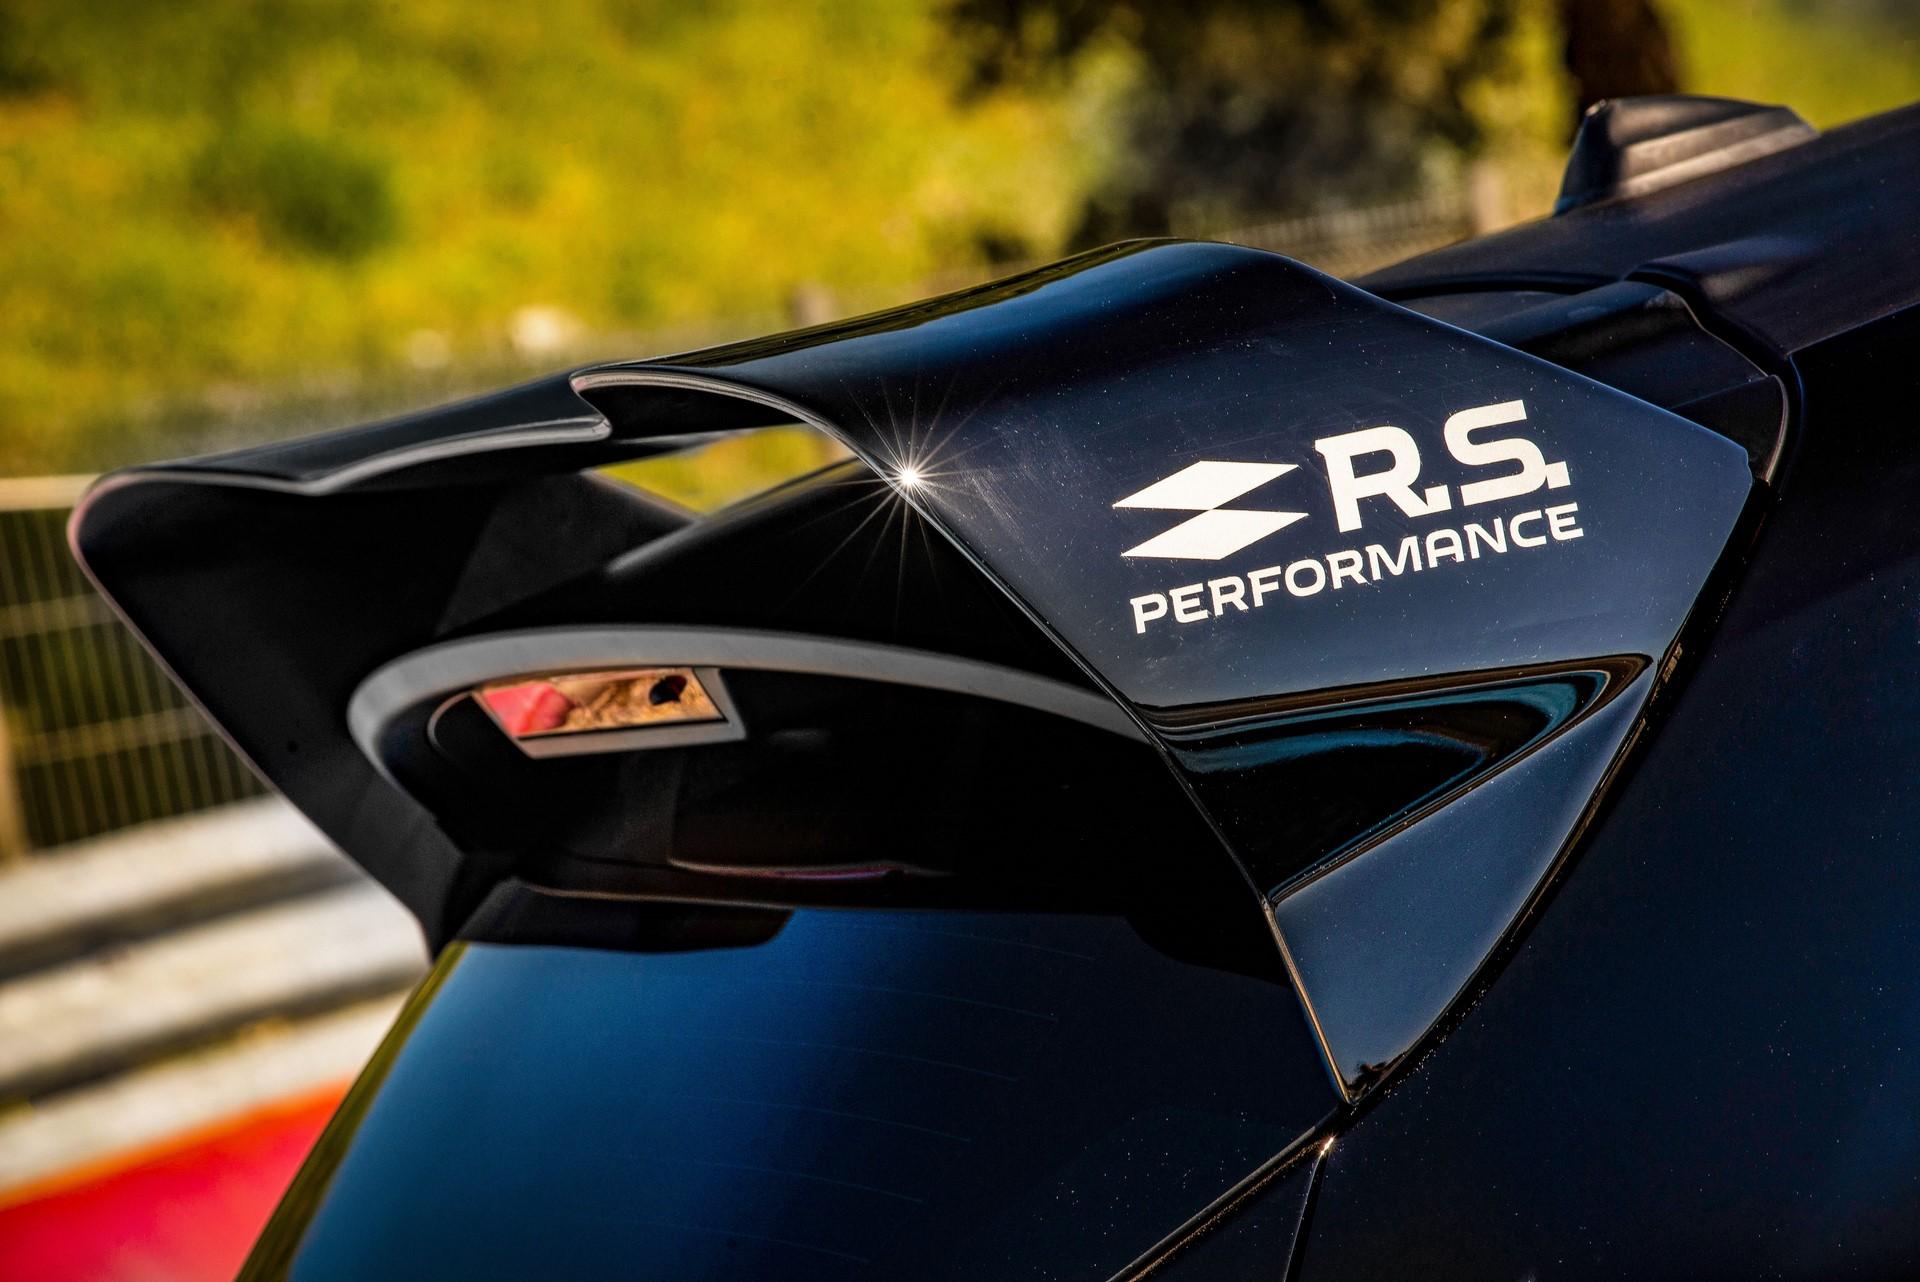 2018 - Gamme Accessoires R.S. Performance